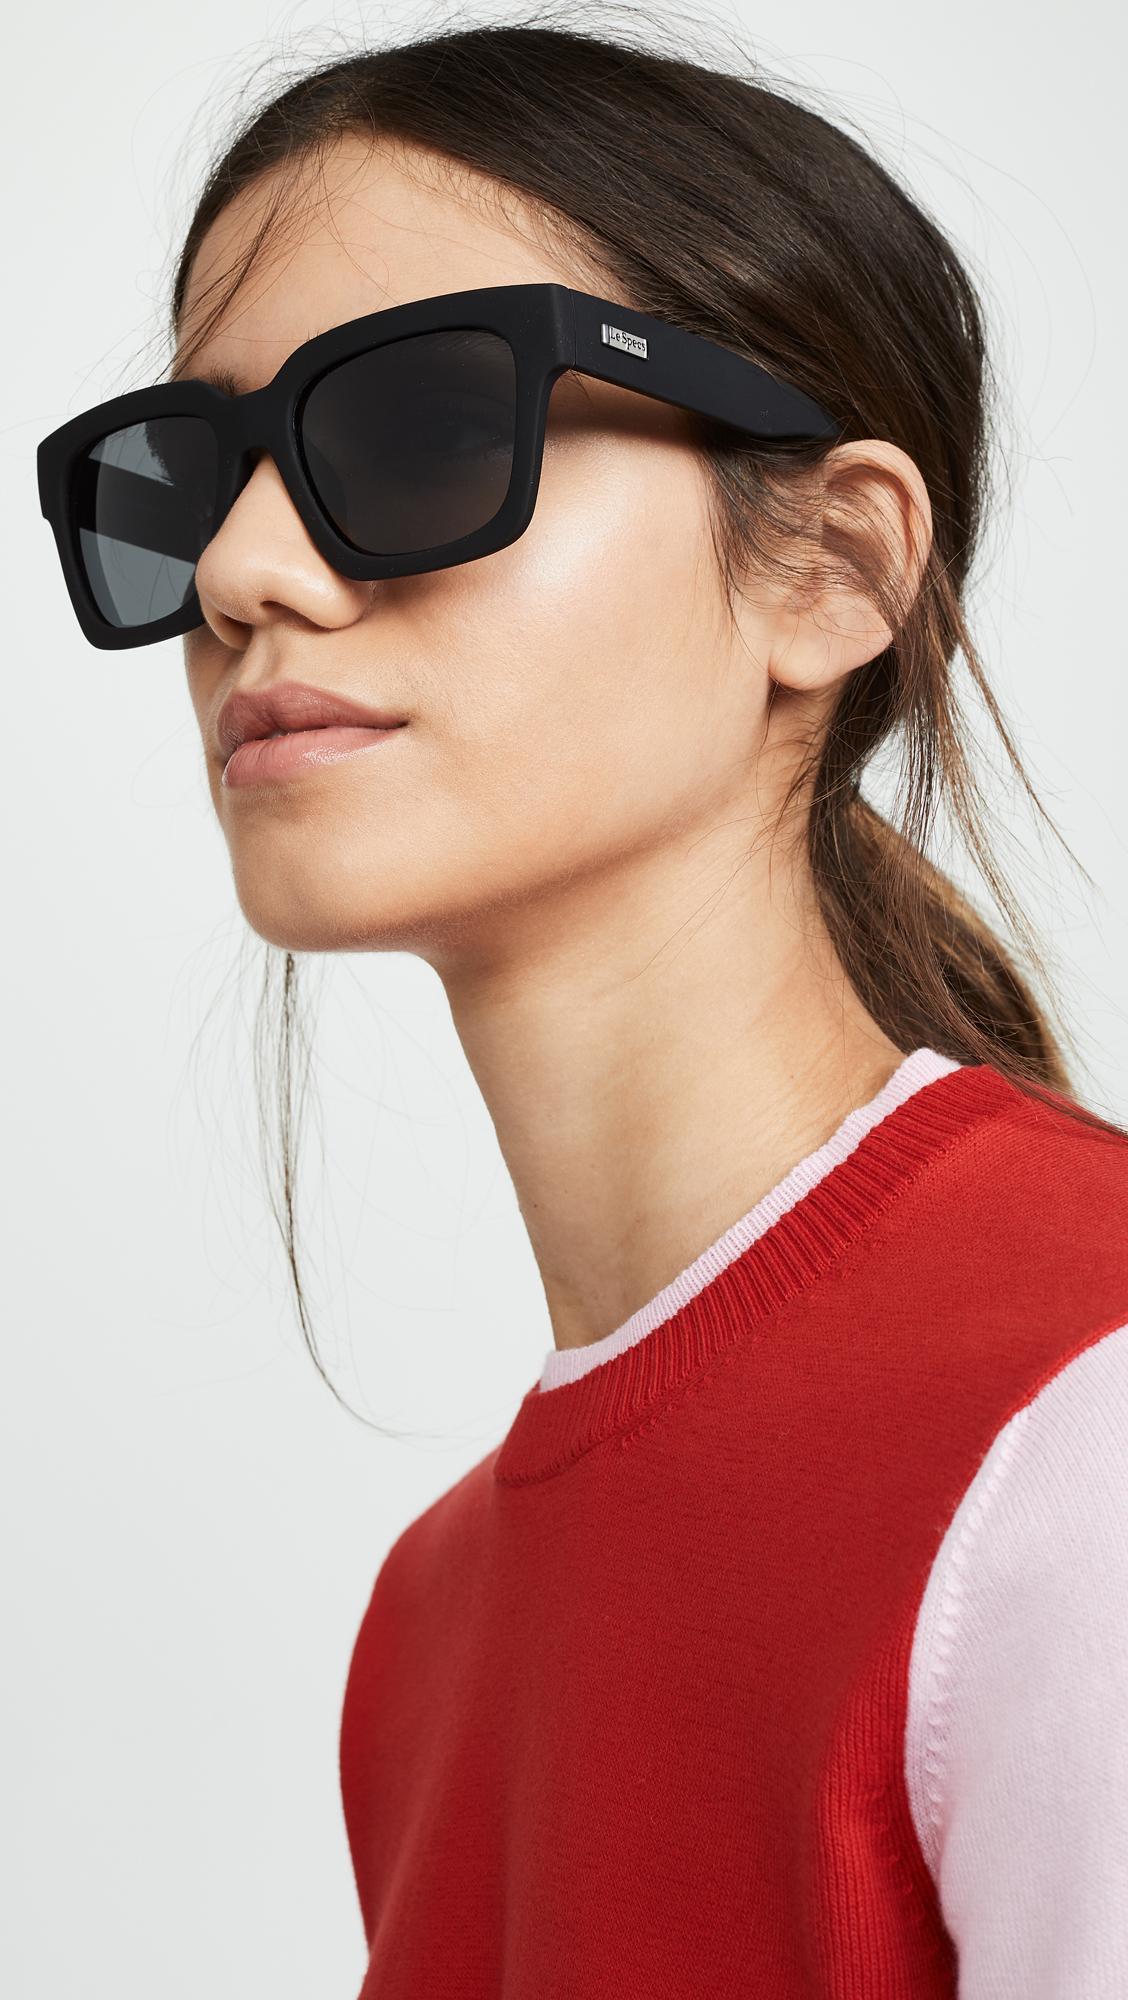 a381ceaf25 Le Specs - Black Weekend Riot Polarized Sunglasses - Lyst. View fullscreen